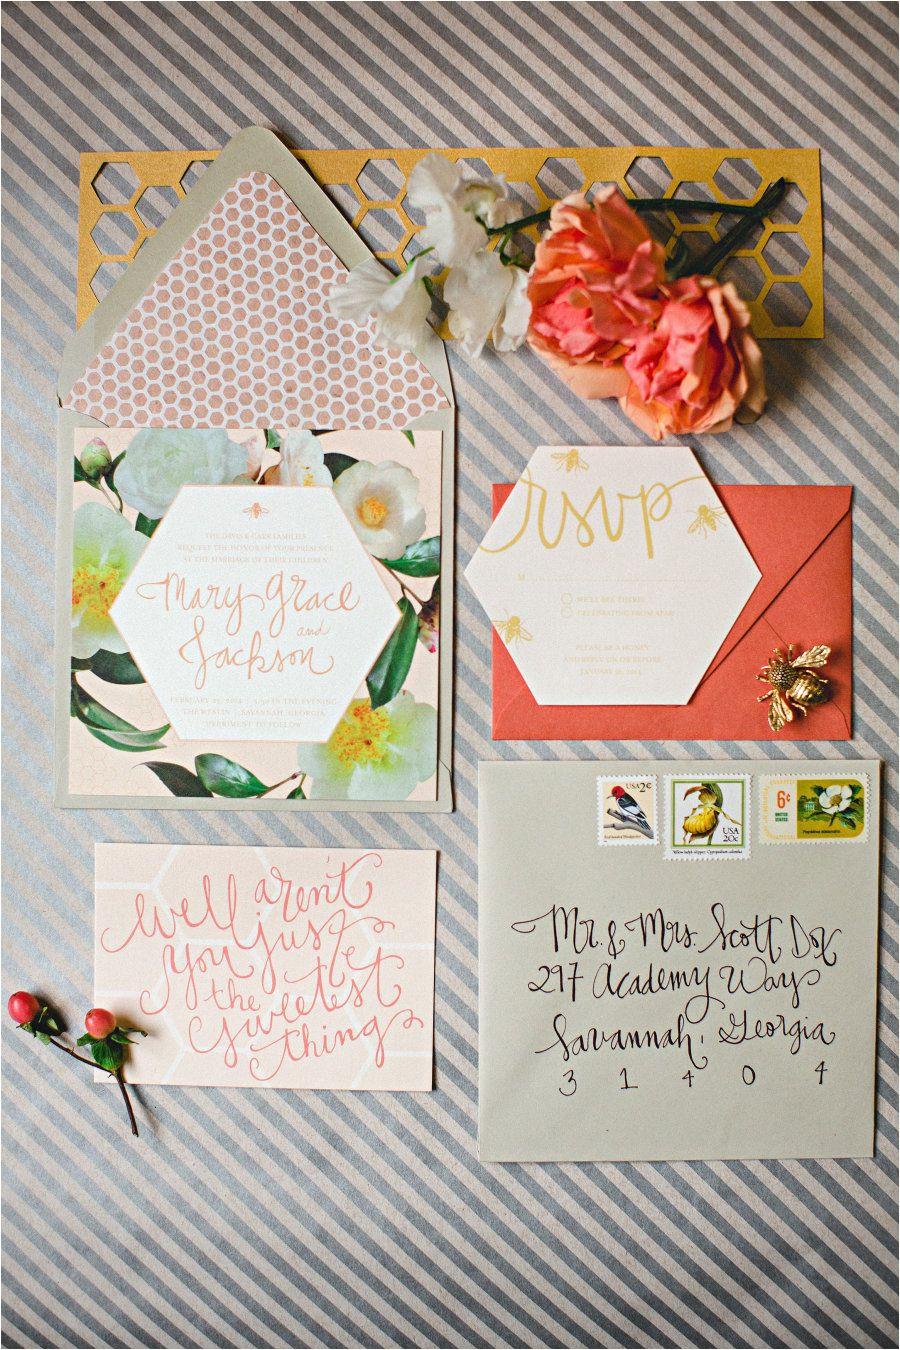 E Card Design for Wedding Romantic Georgian Wedding Inspiration with Images